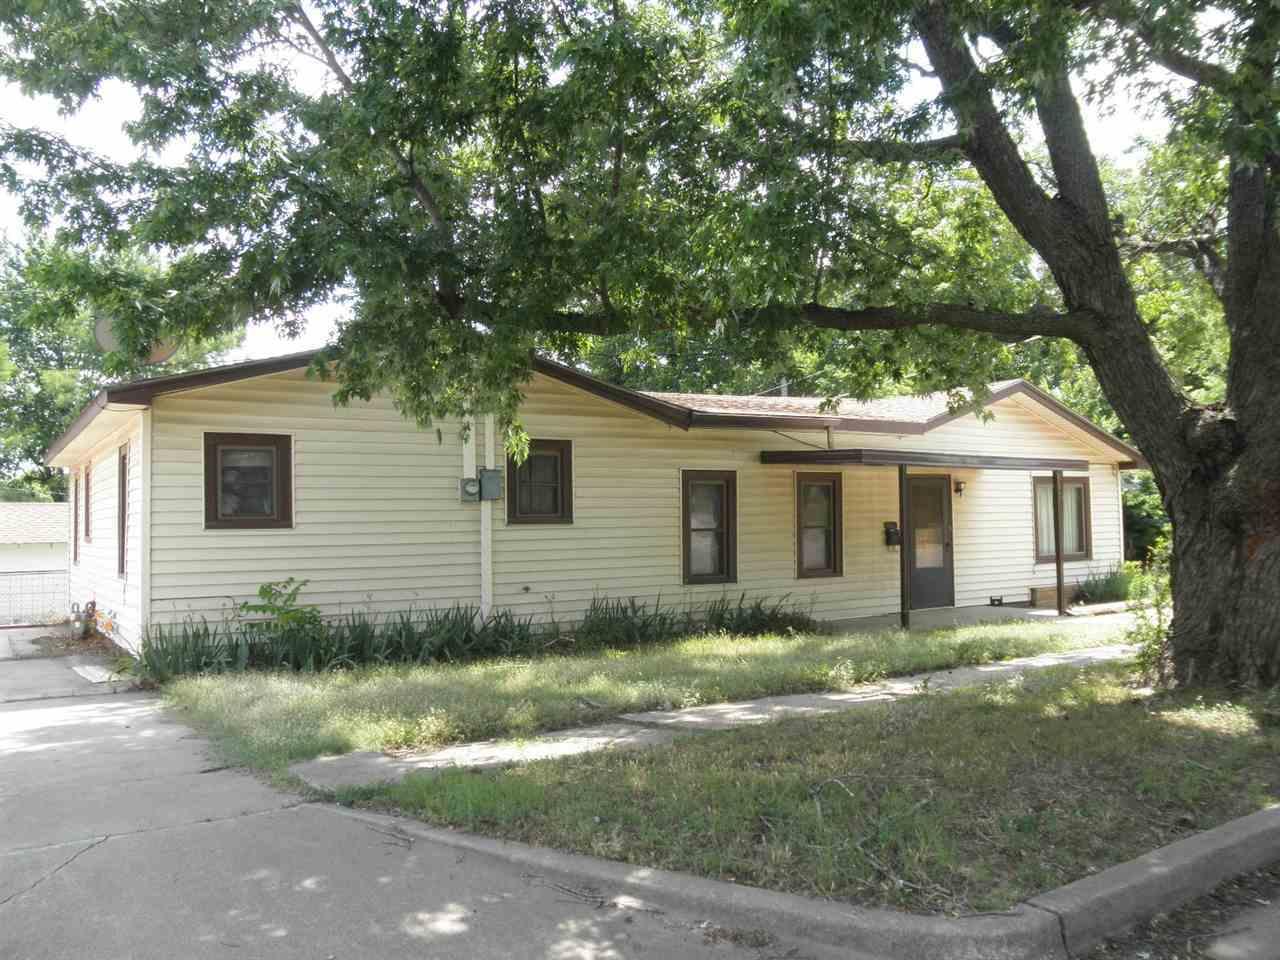 Sold Cross Sale W/ MLS | 916 E Cherry Ponca City, OK 74601 0